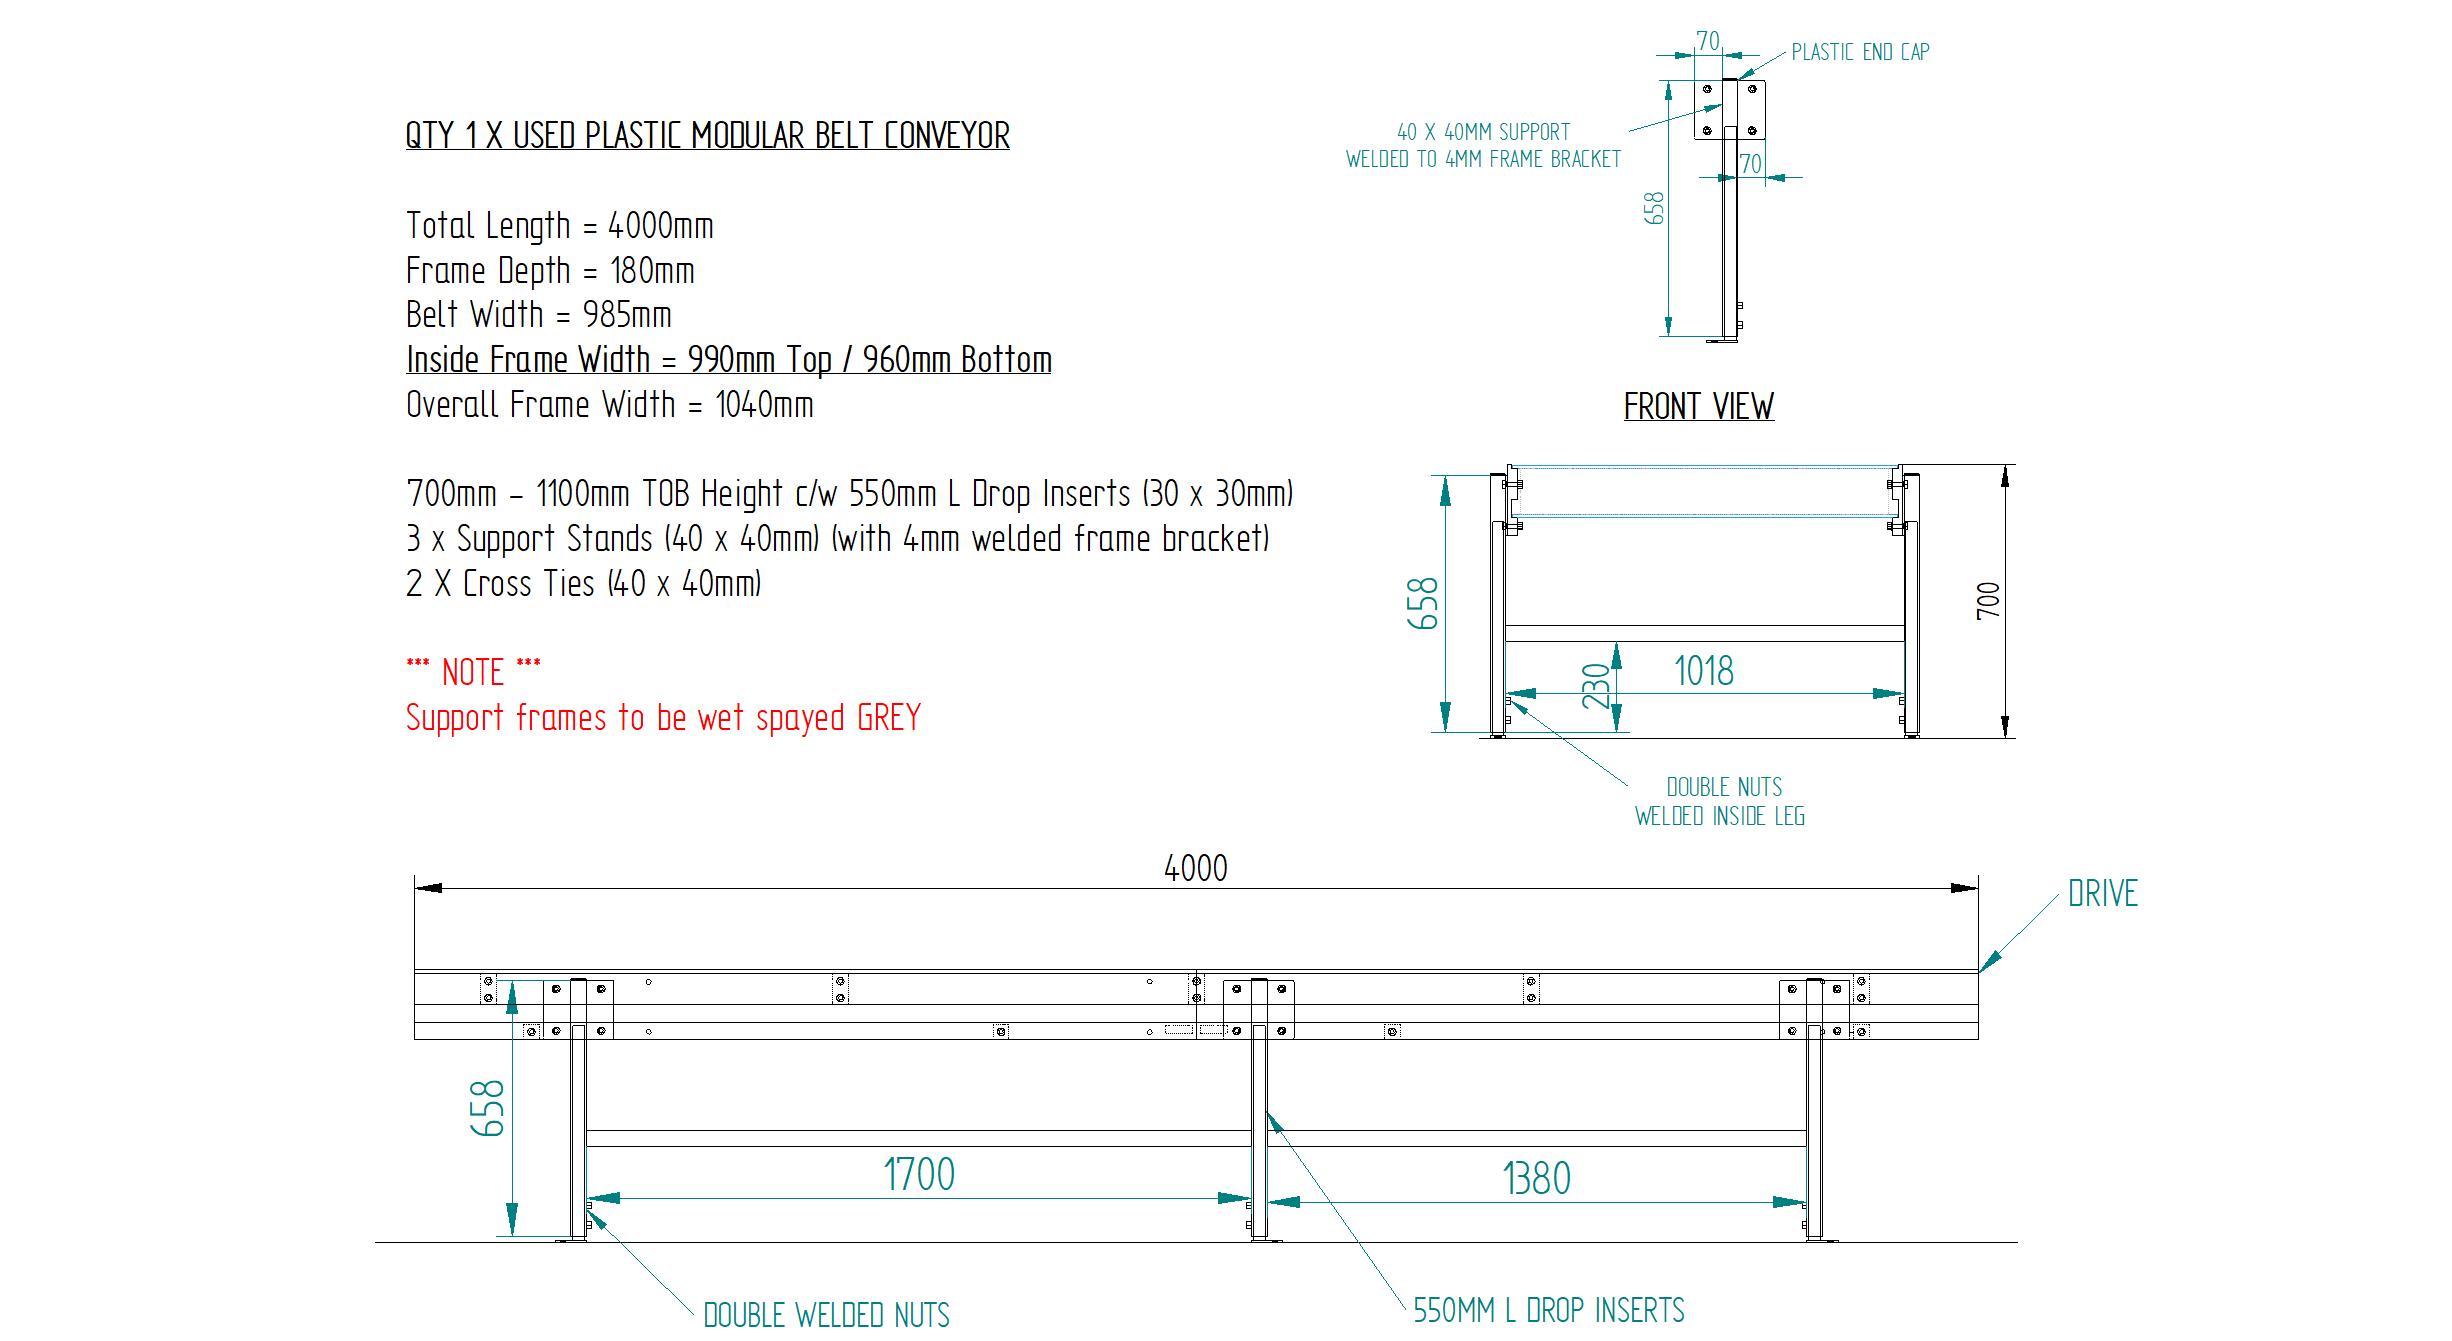 Workshop Drawing 4000mm L x 985mm W Used Plastic Modular Belt Conveyor